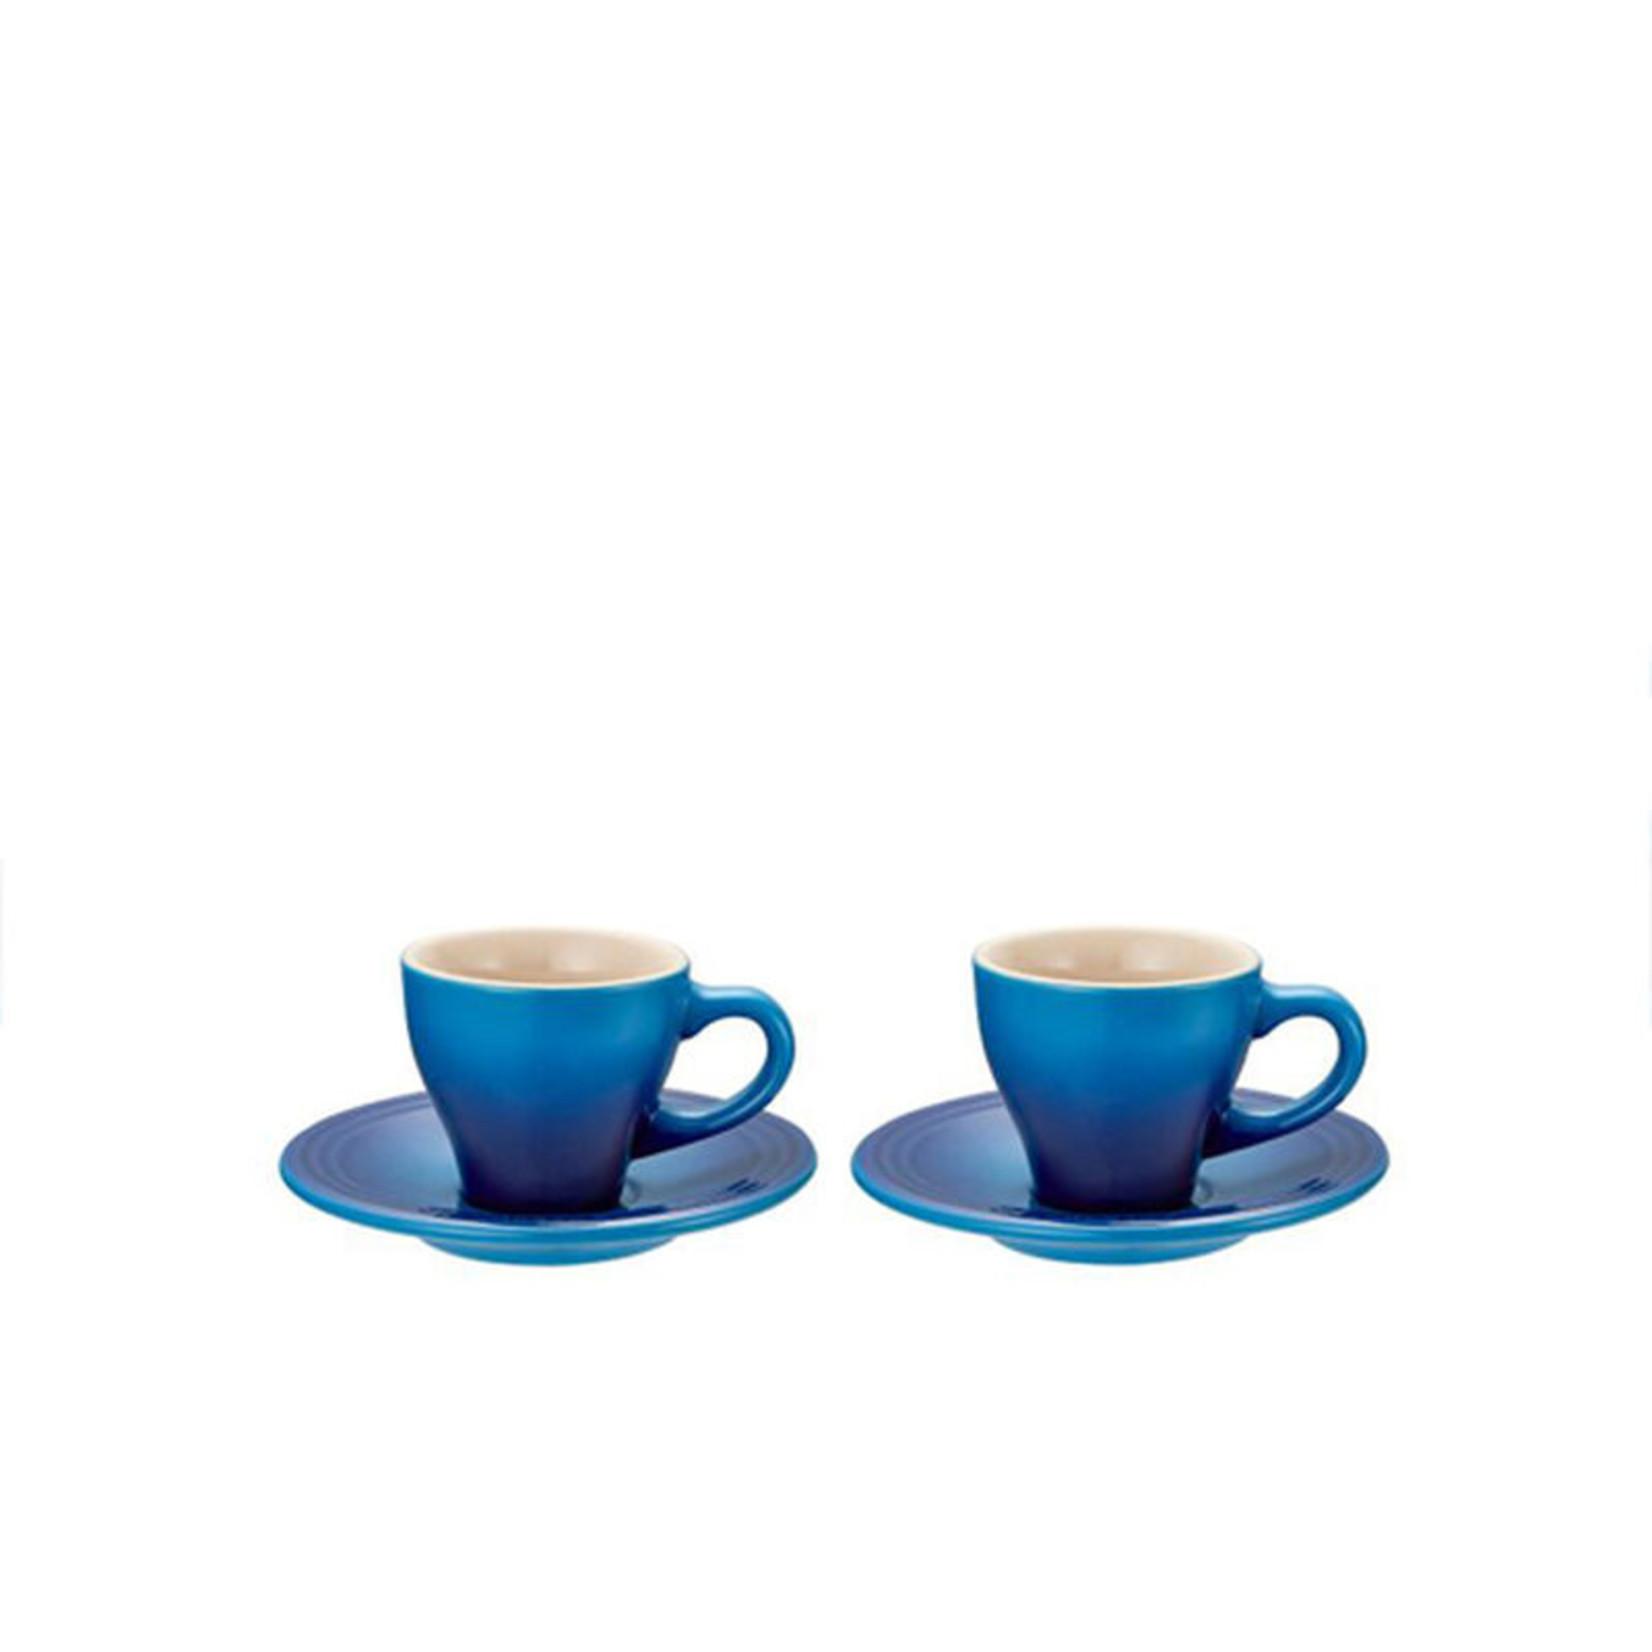 Le Creuset Set of 2 Classic Espresso Cups